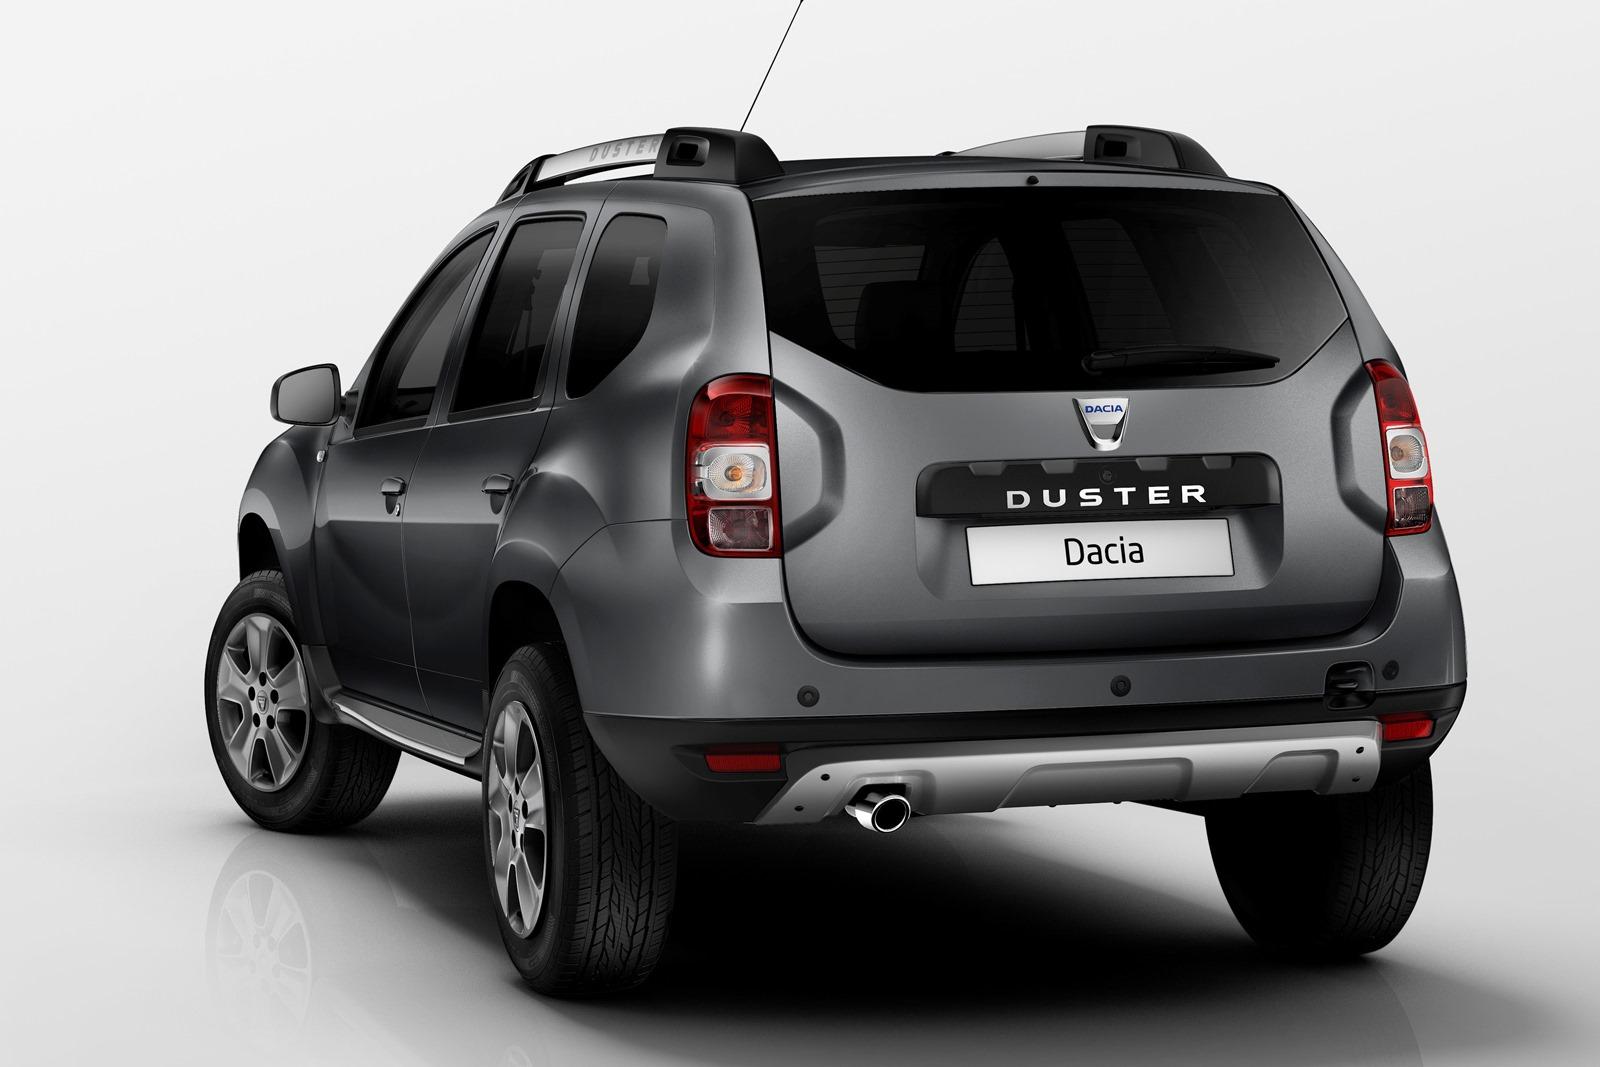 Dacia-Duster-facelift-5[4]